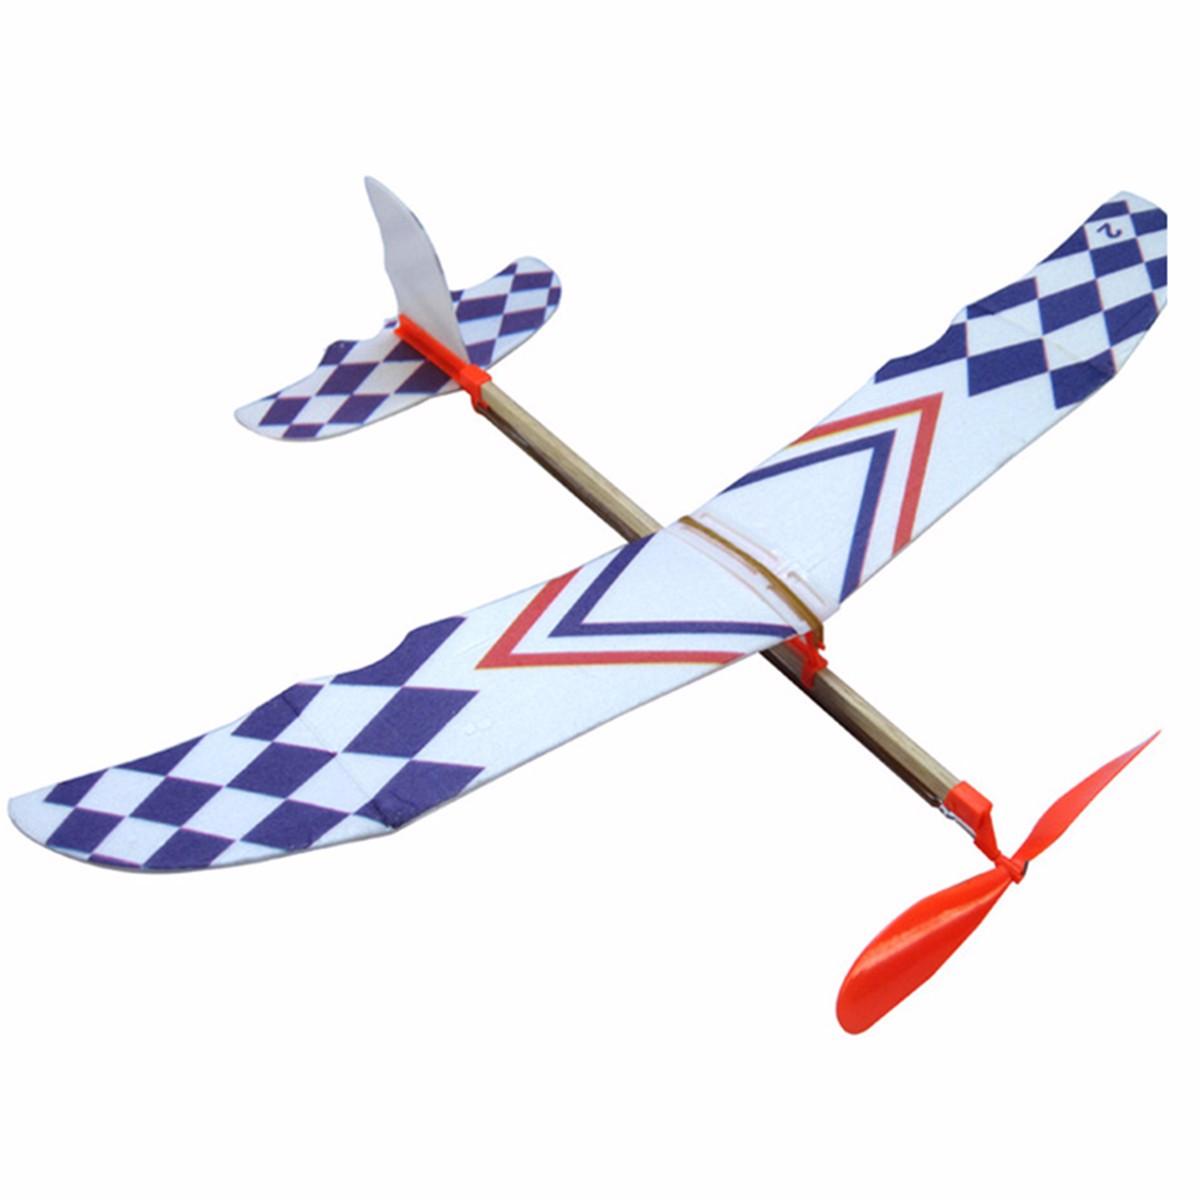 Elastic Rubber Band Powered Diy Foam Plane Kit Aircraft